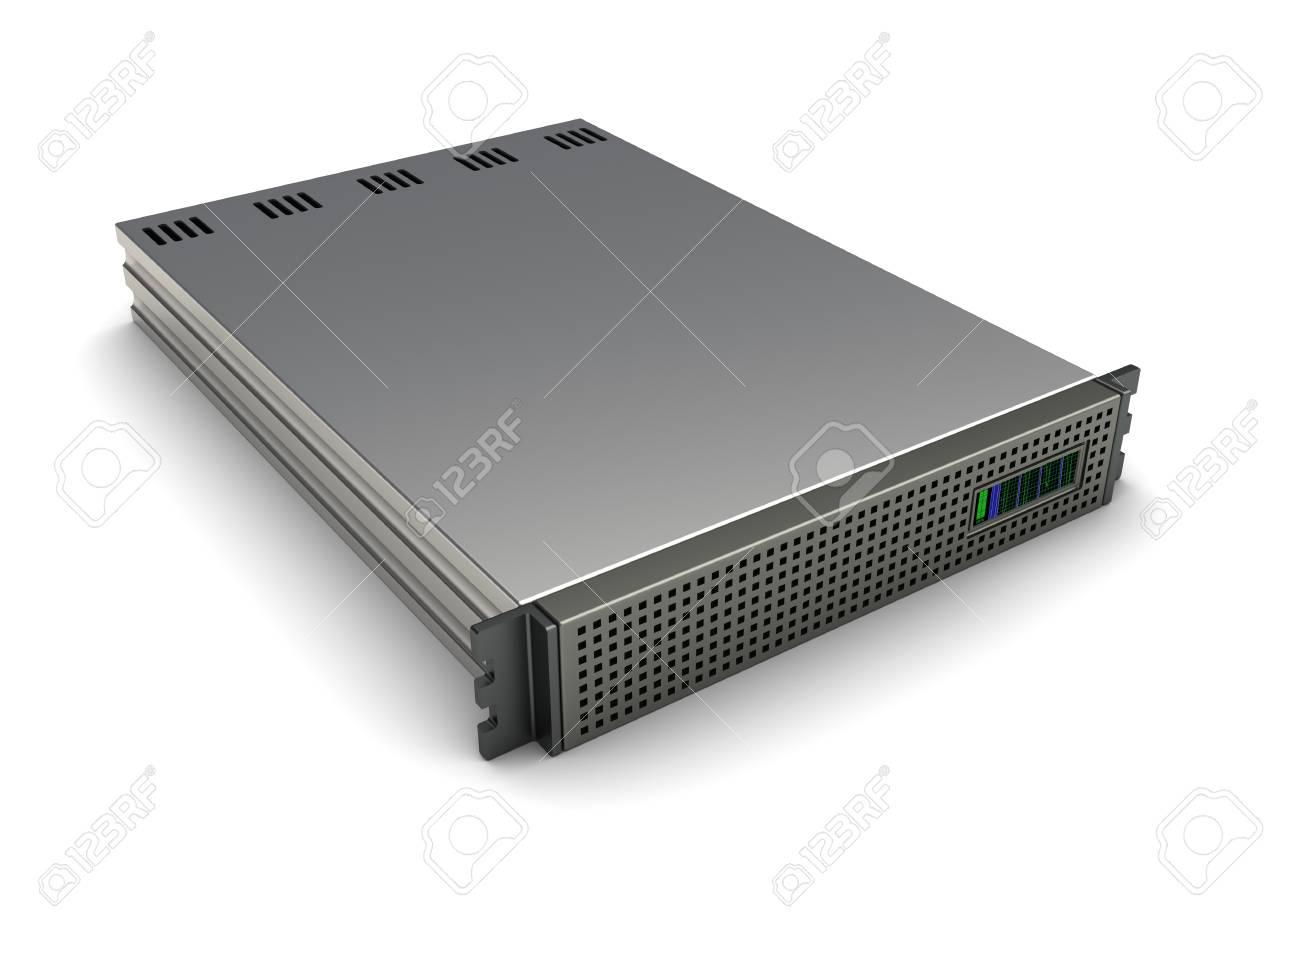 3d image, server equipment isolated on white background Stock Photo - 16291008